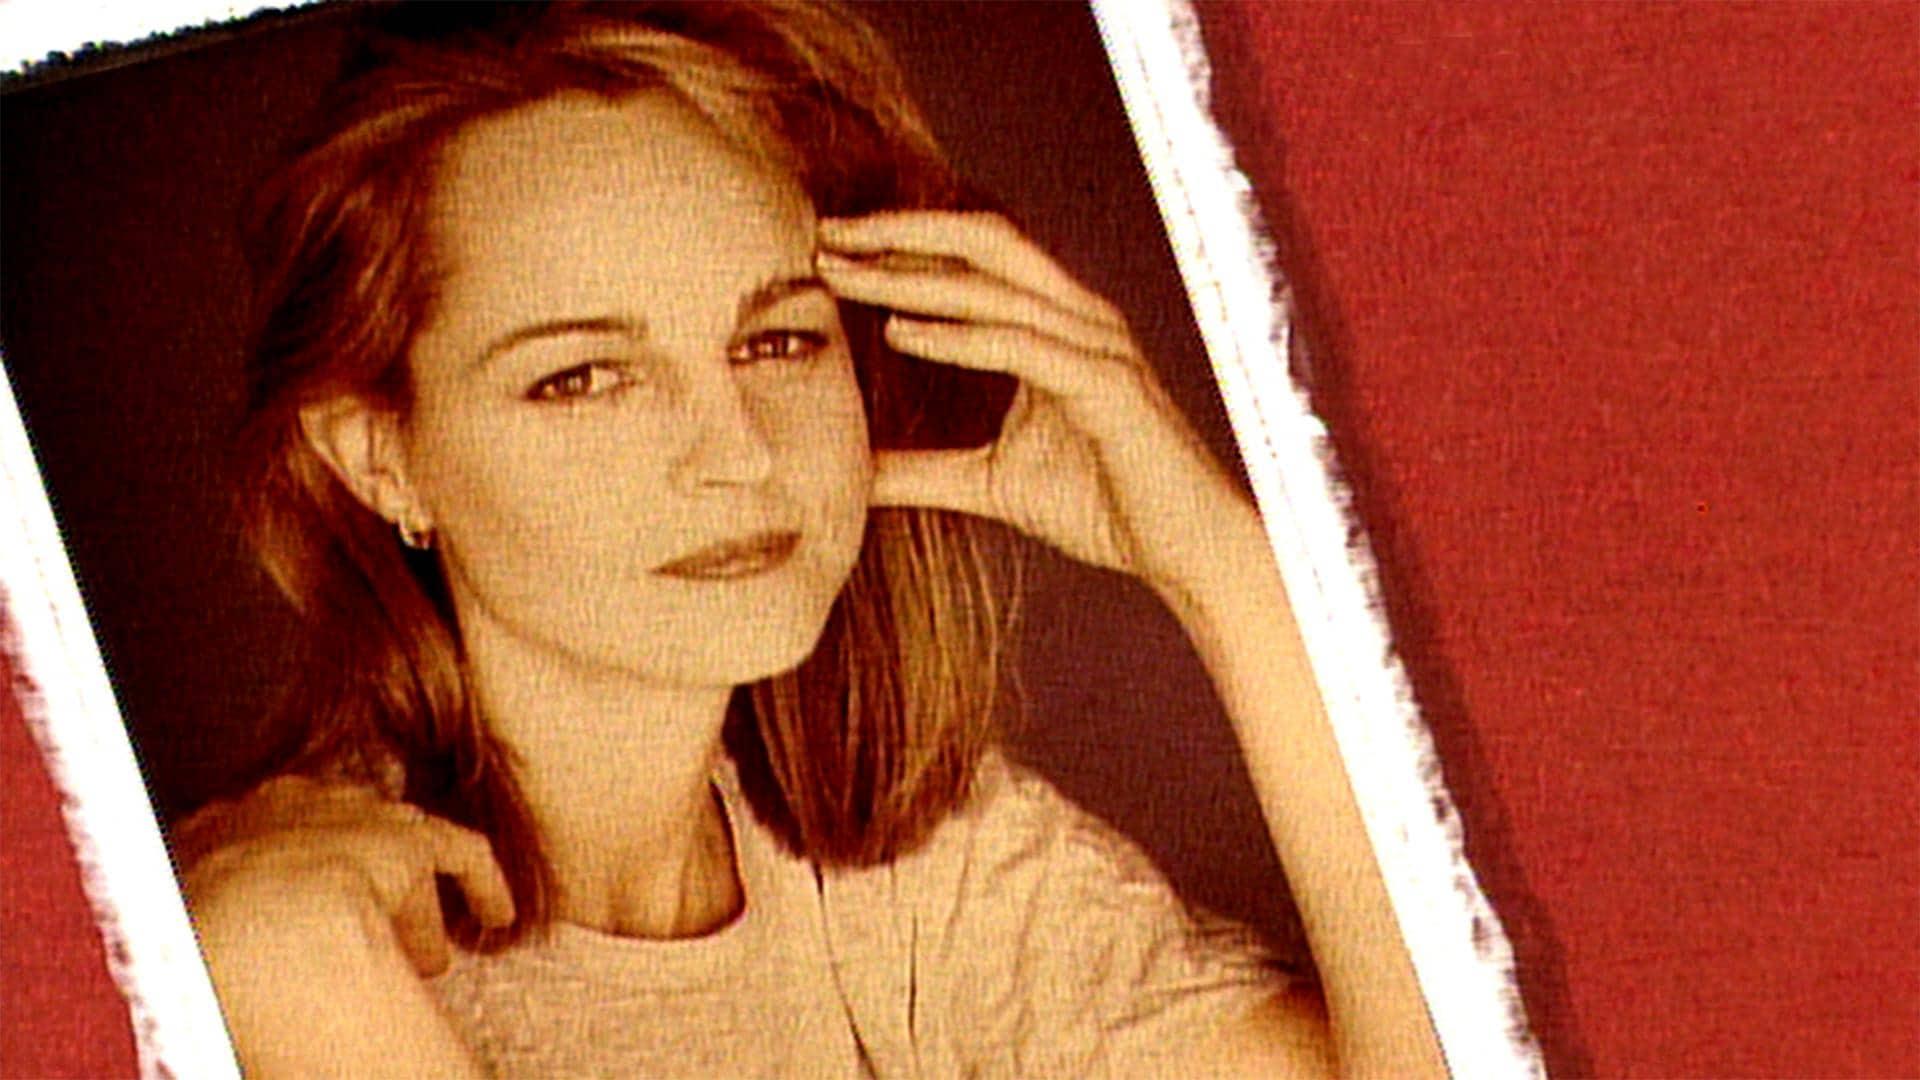 Helen Hunt: March 19, 1994